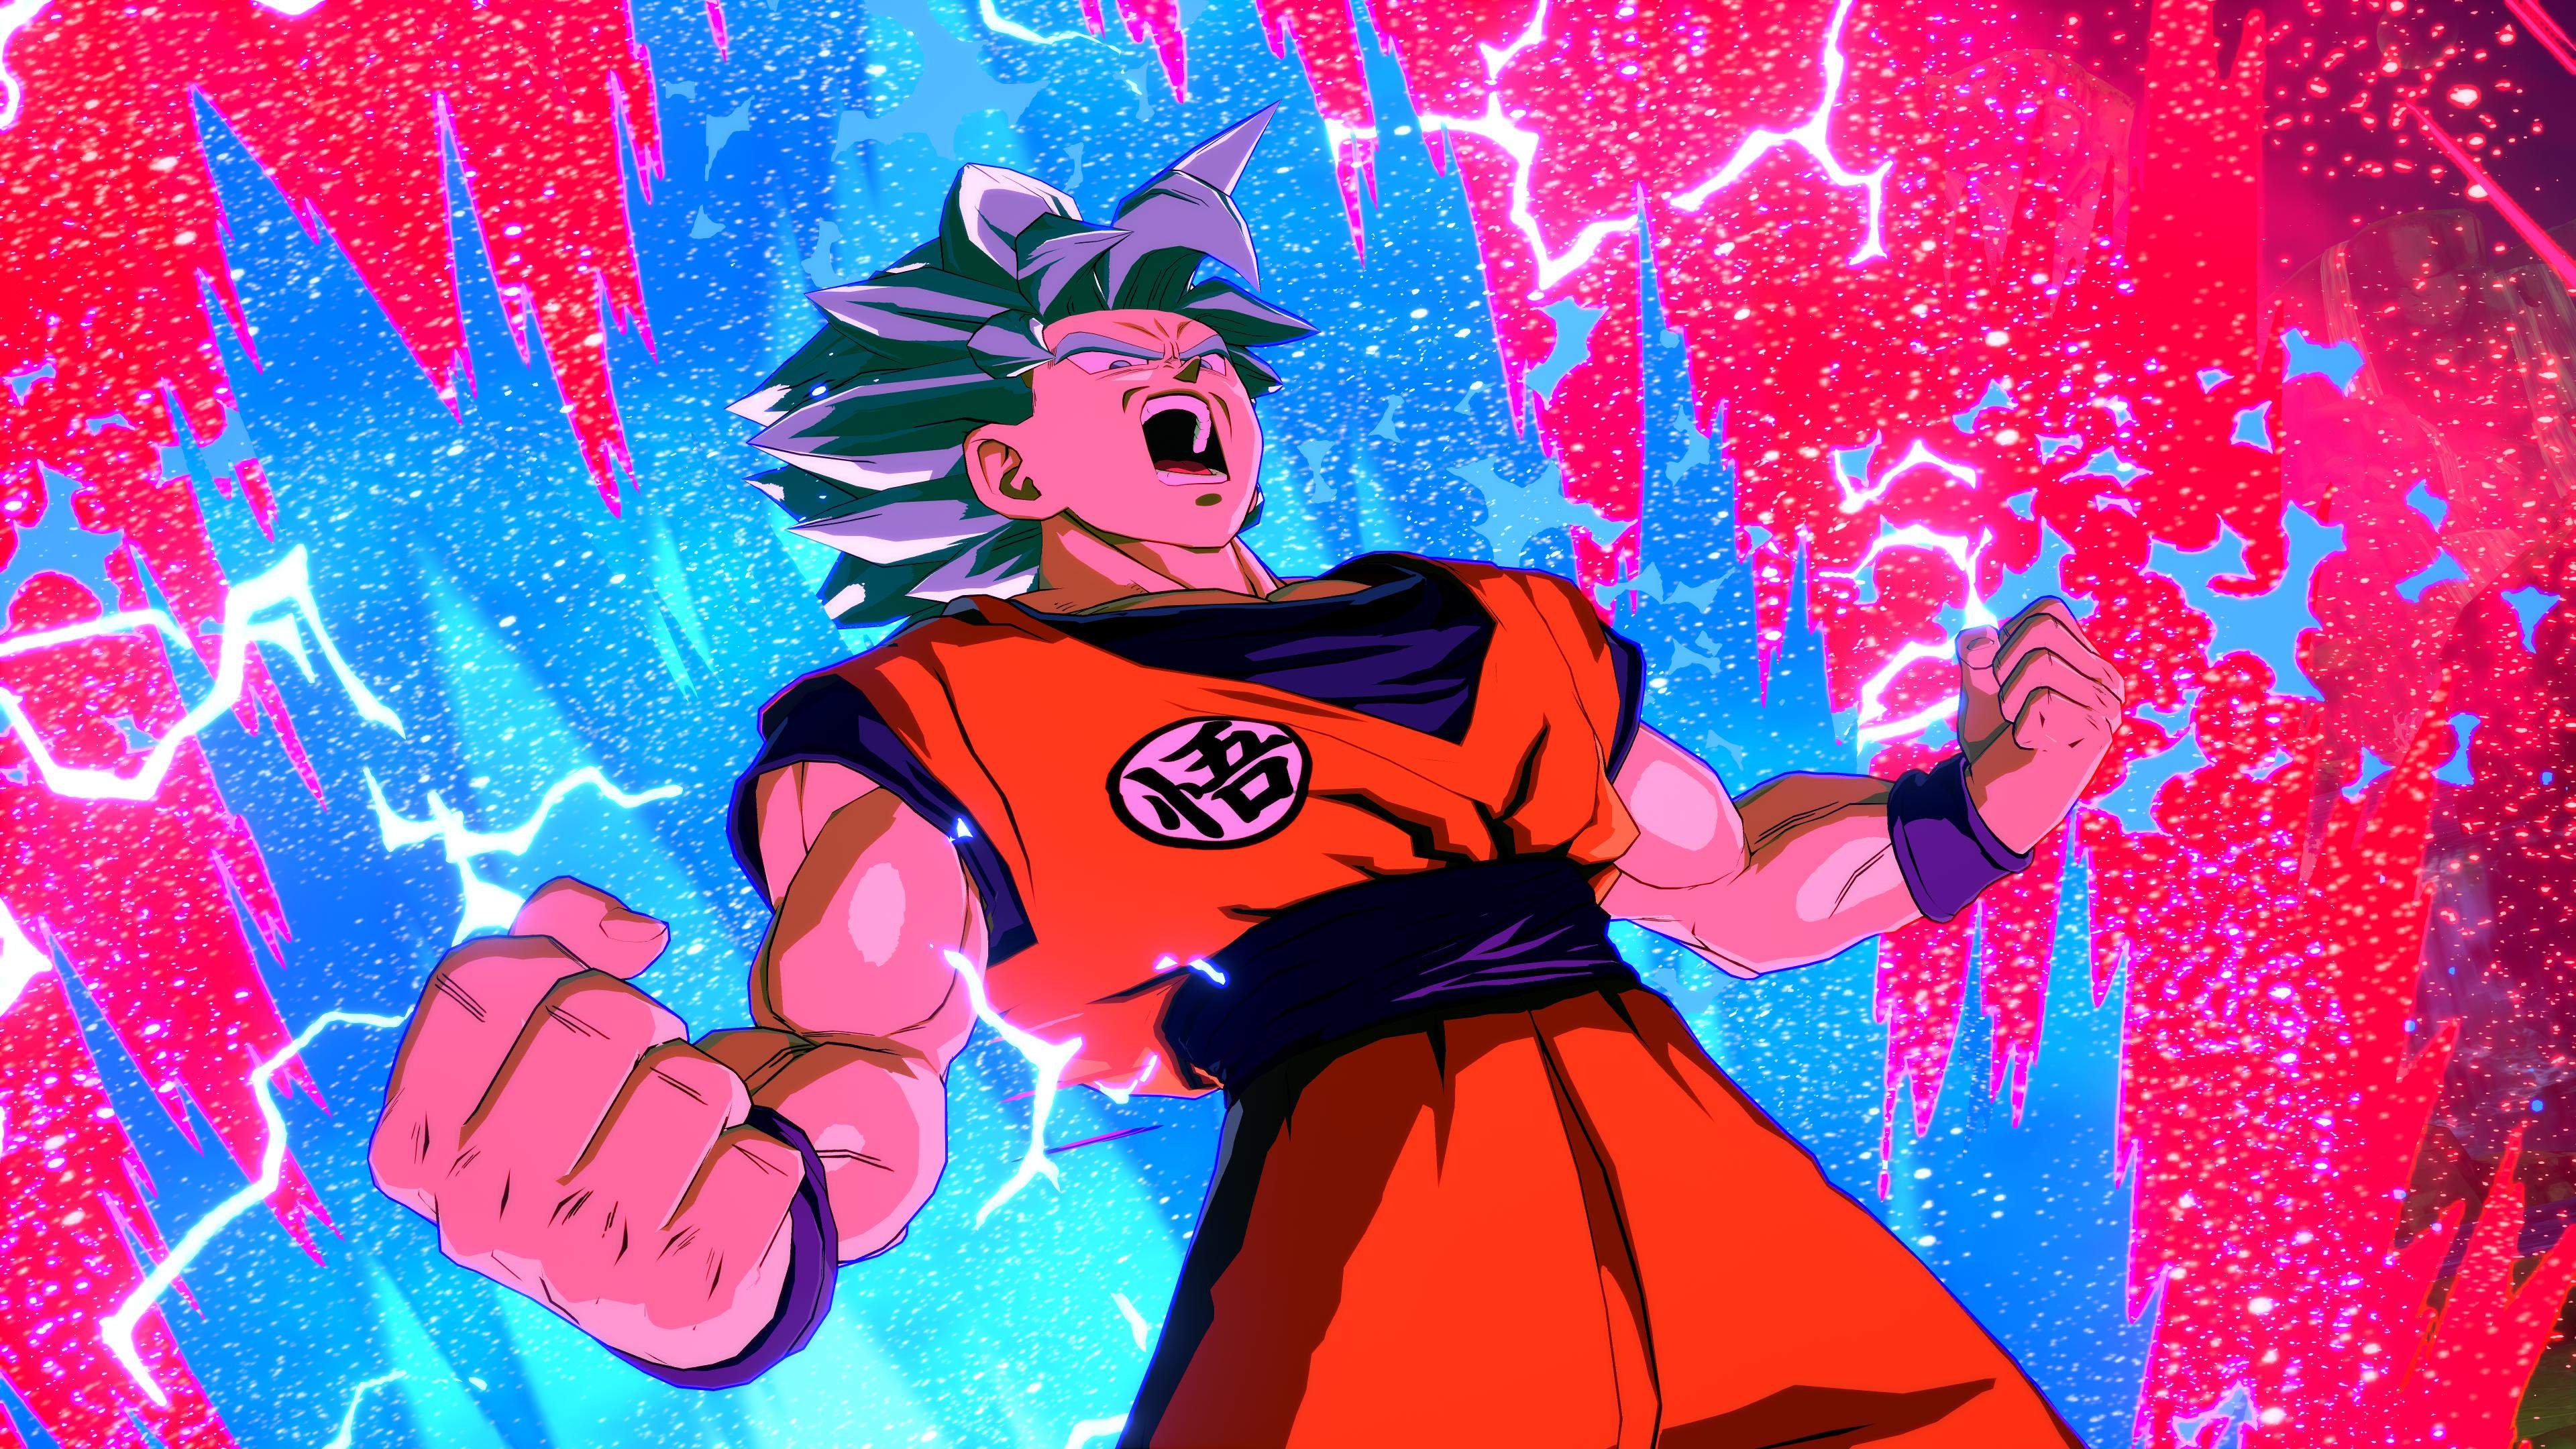 Goku Kaioken Wallpapers   Top Goku Kaioken Backgrounds 3840x2160